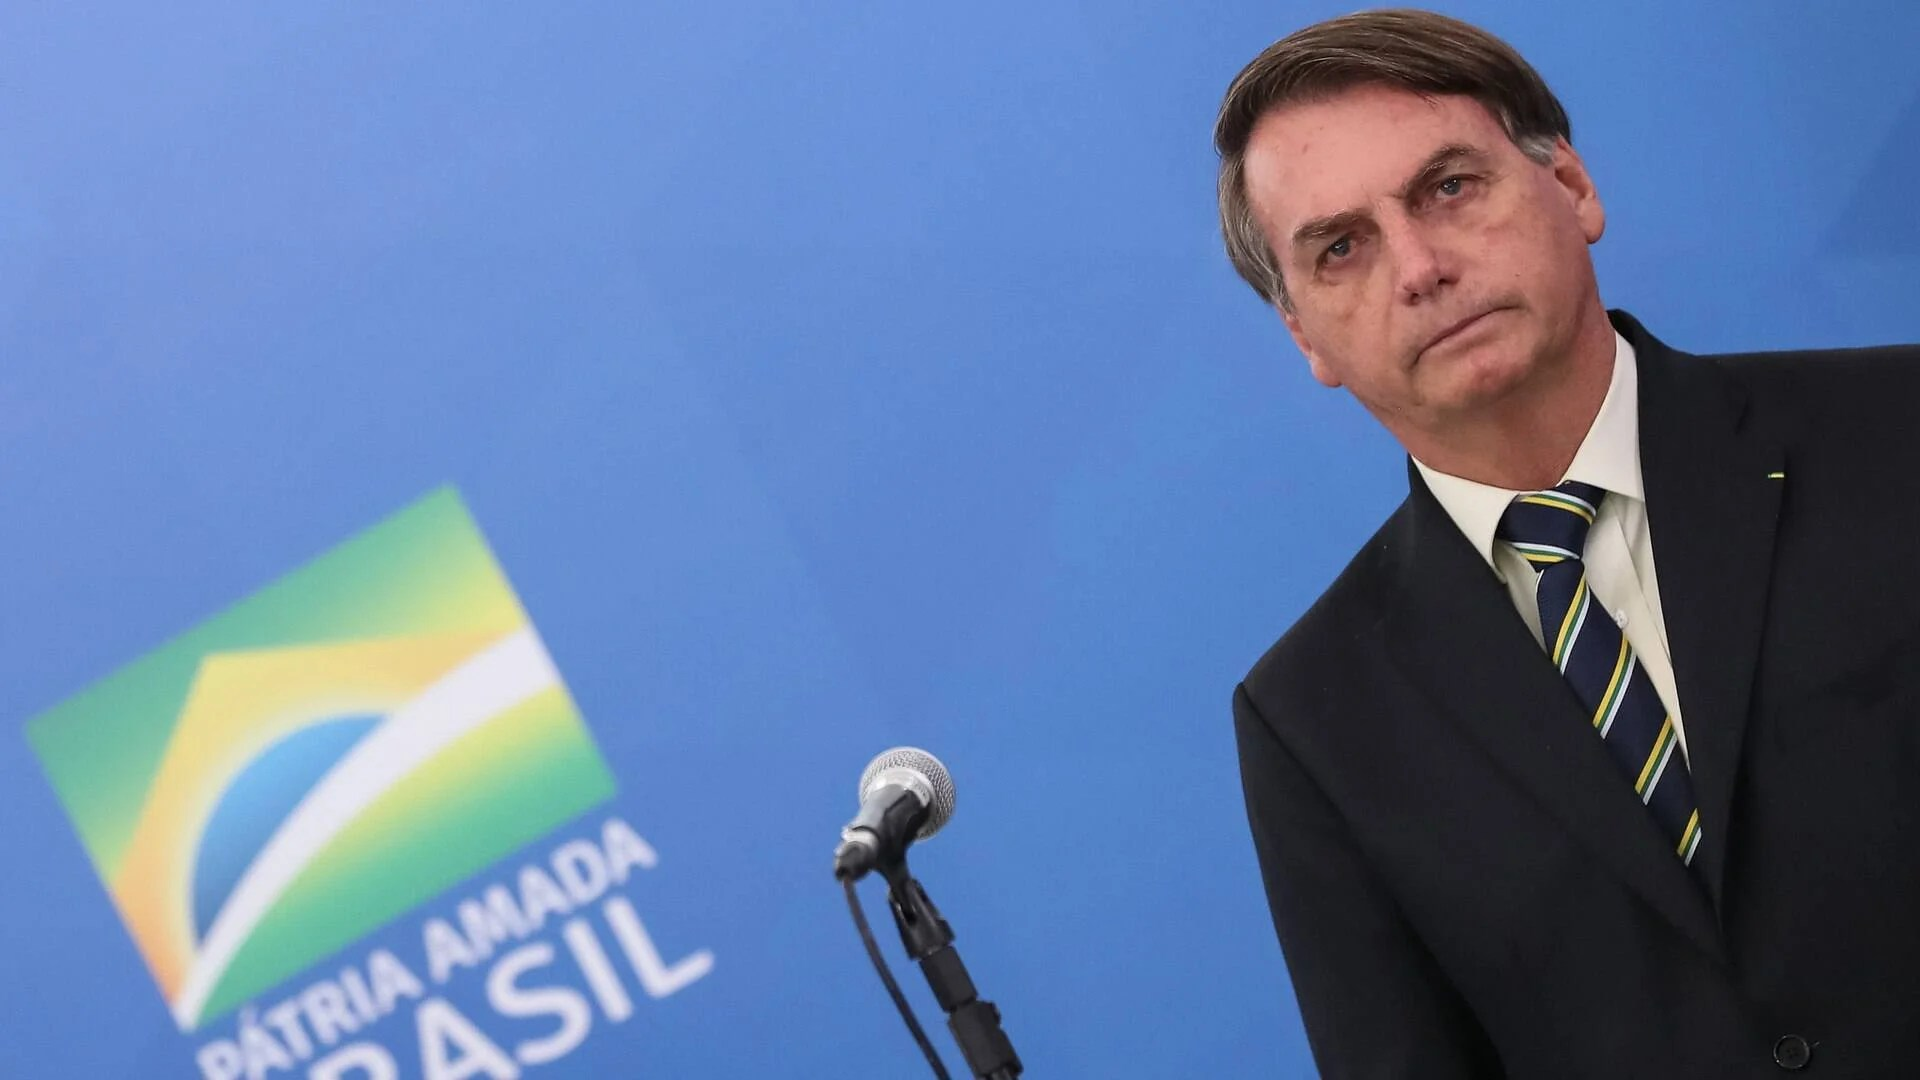 Bolsonaro deve vetar trecho do projeto que amplia auxílio - Economia - iG